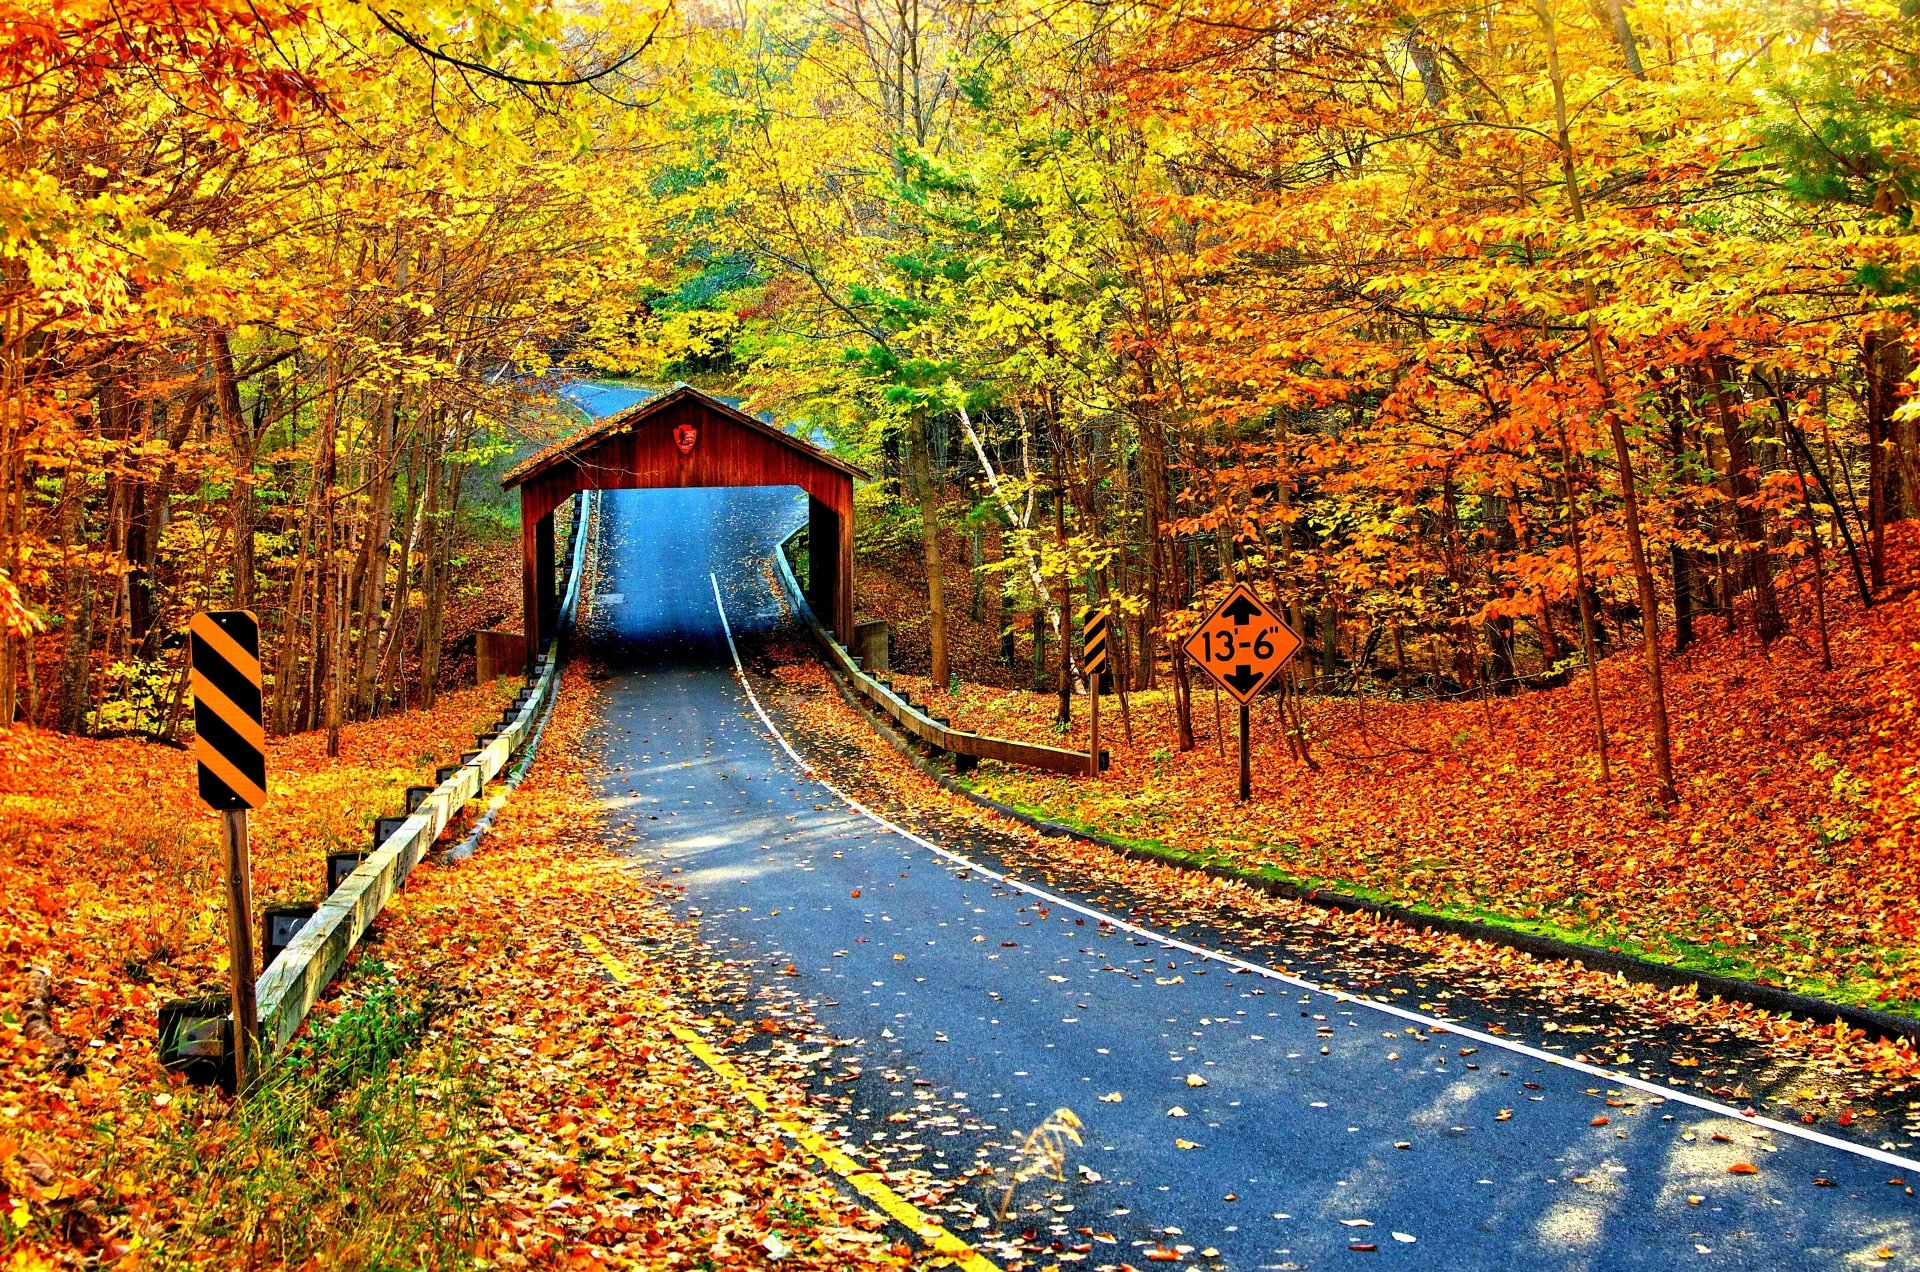 Covered Bridge On Autumn Road 4k Ultra HD Wallpaper